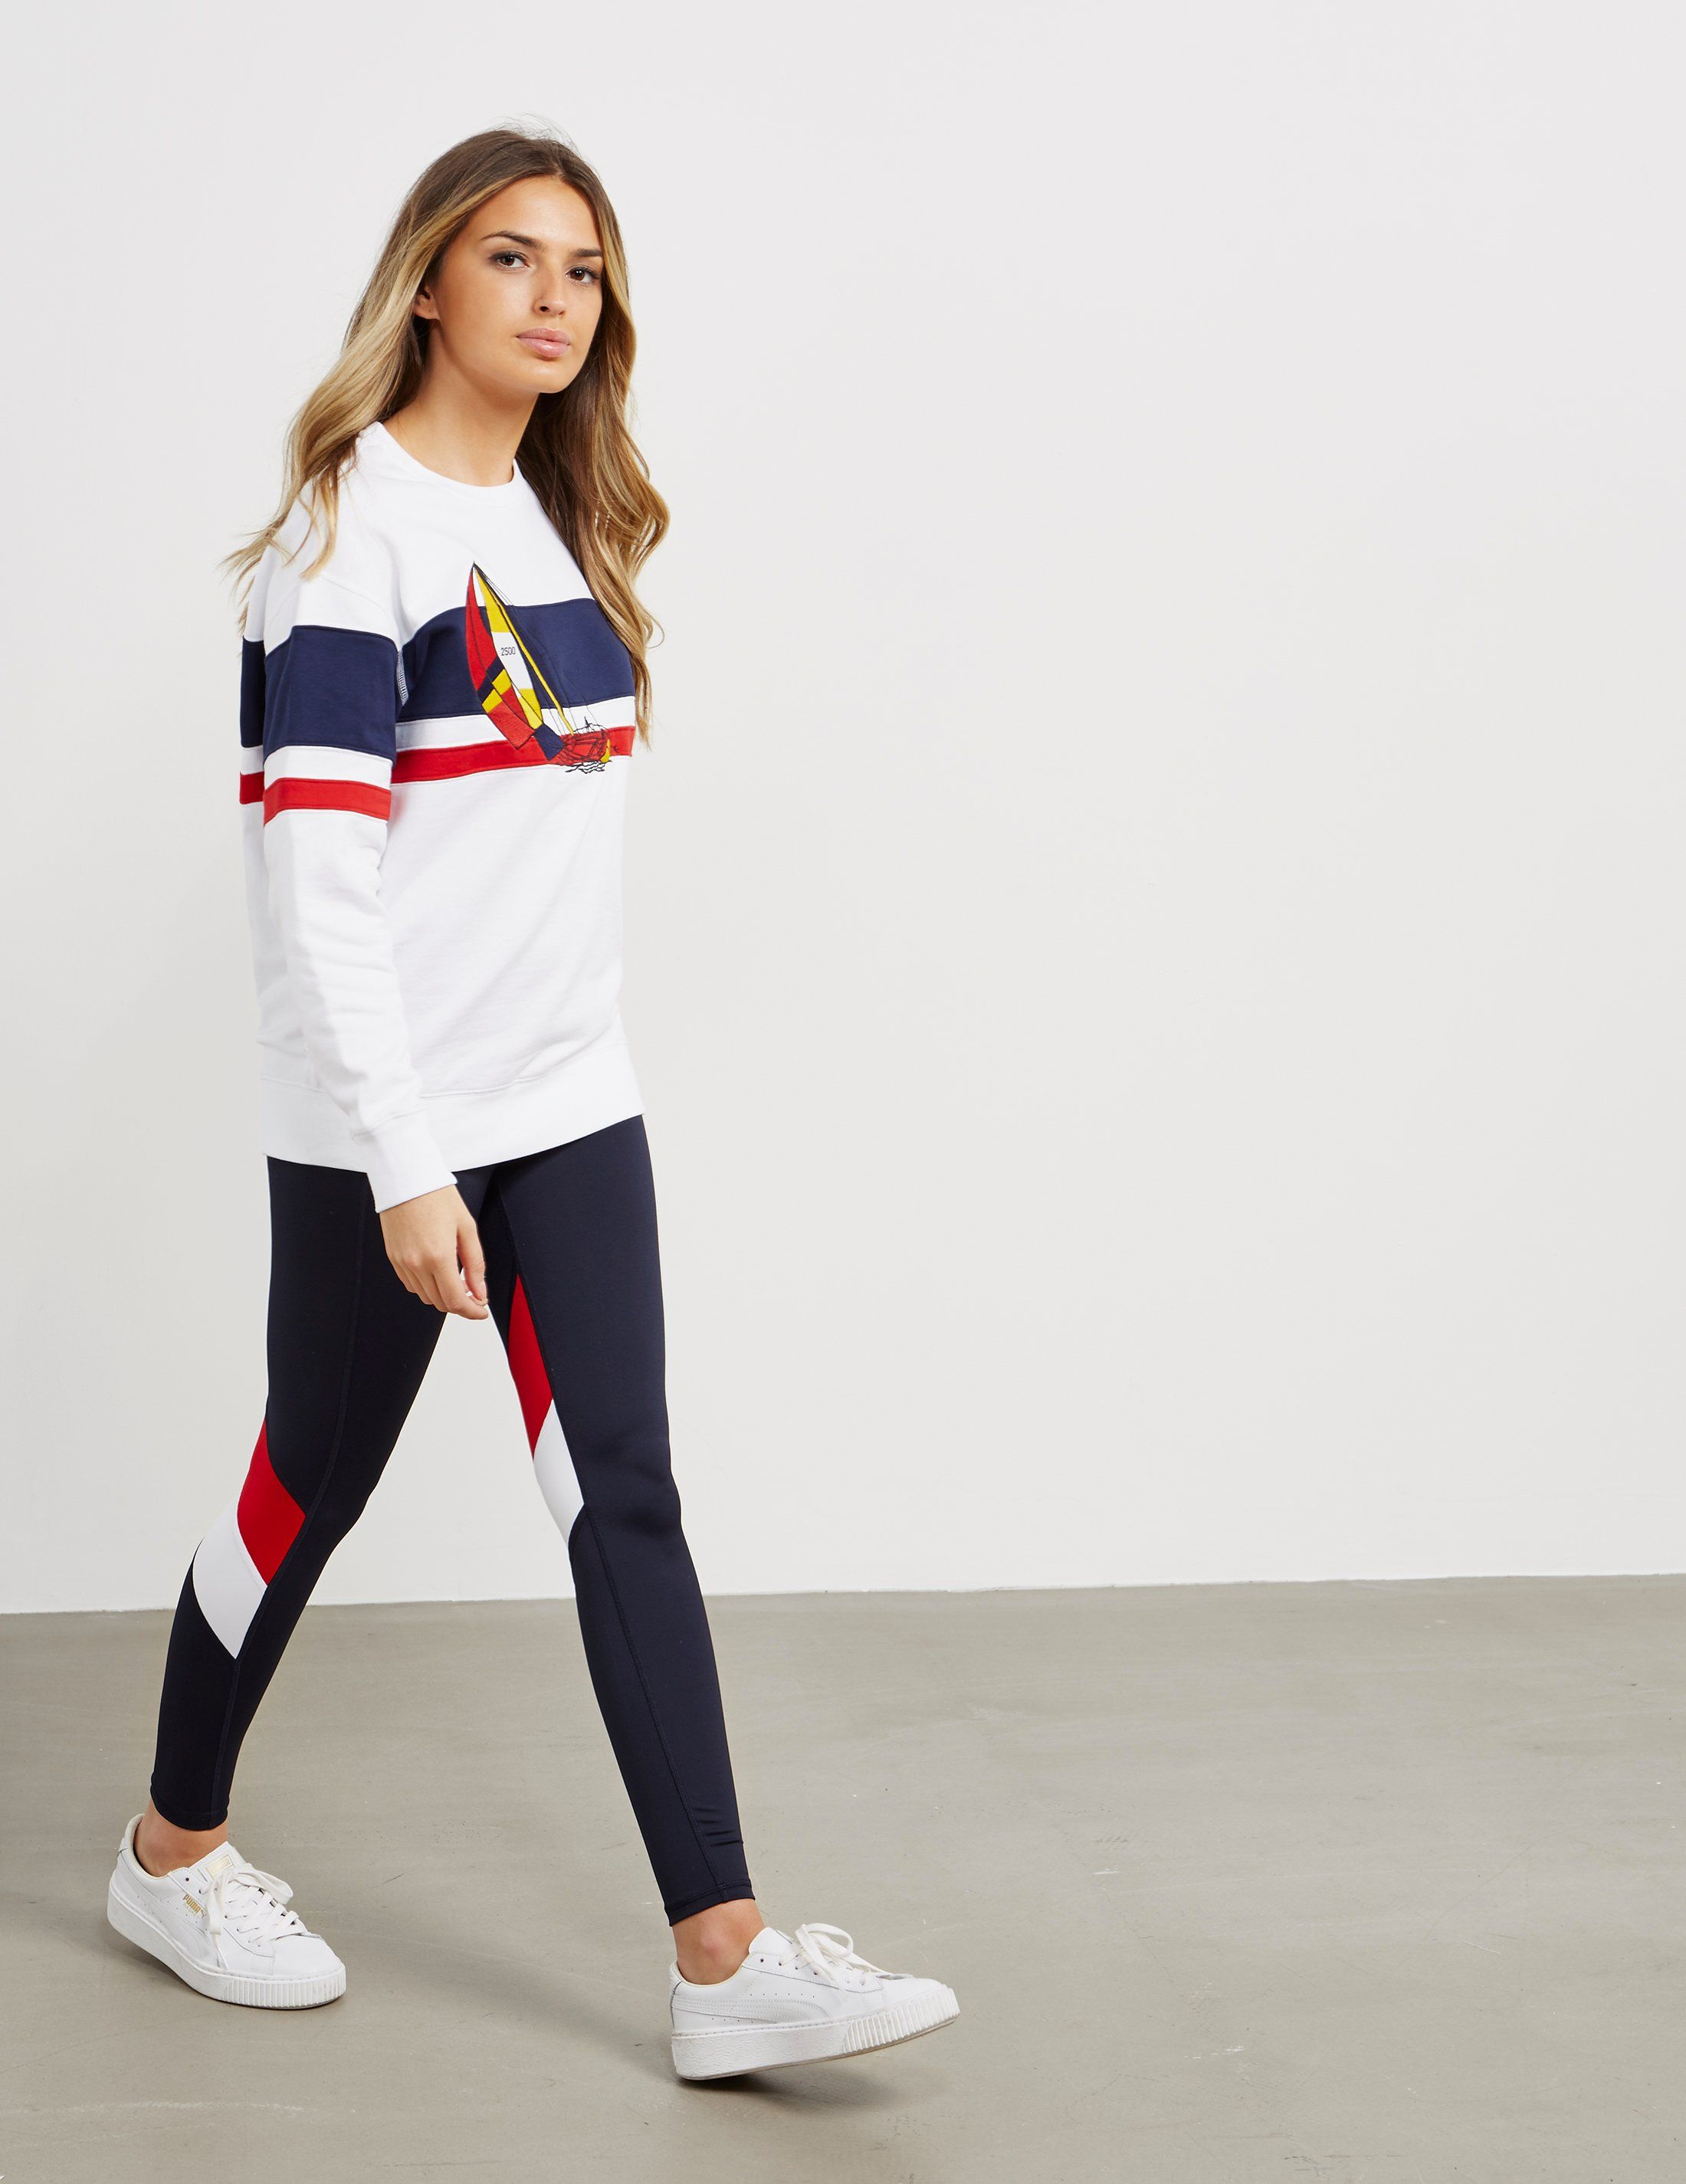 Polo Ralph Lauren CP-93 Sail Stripe Sweatshirt - Online Exclusive